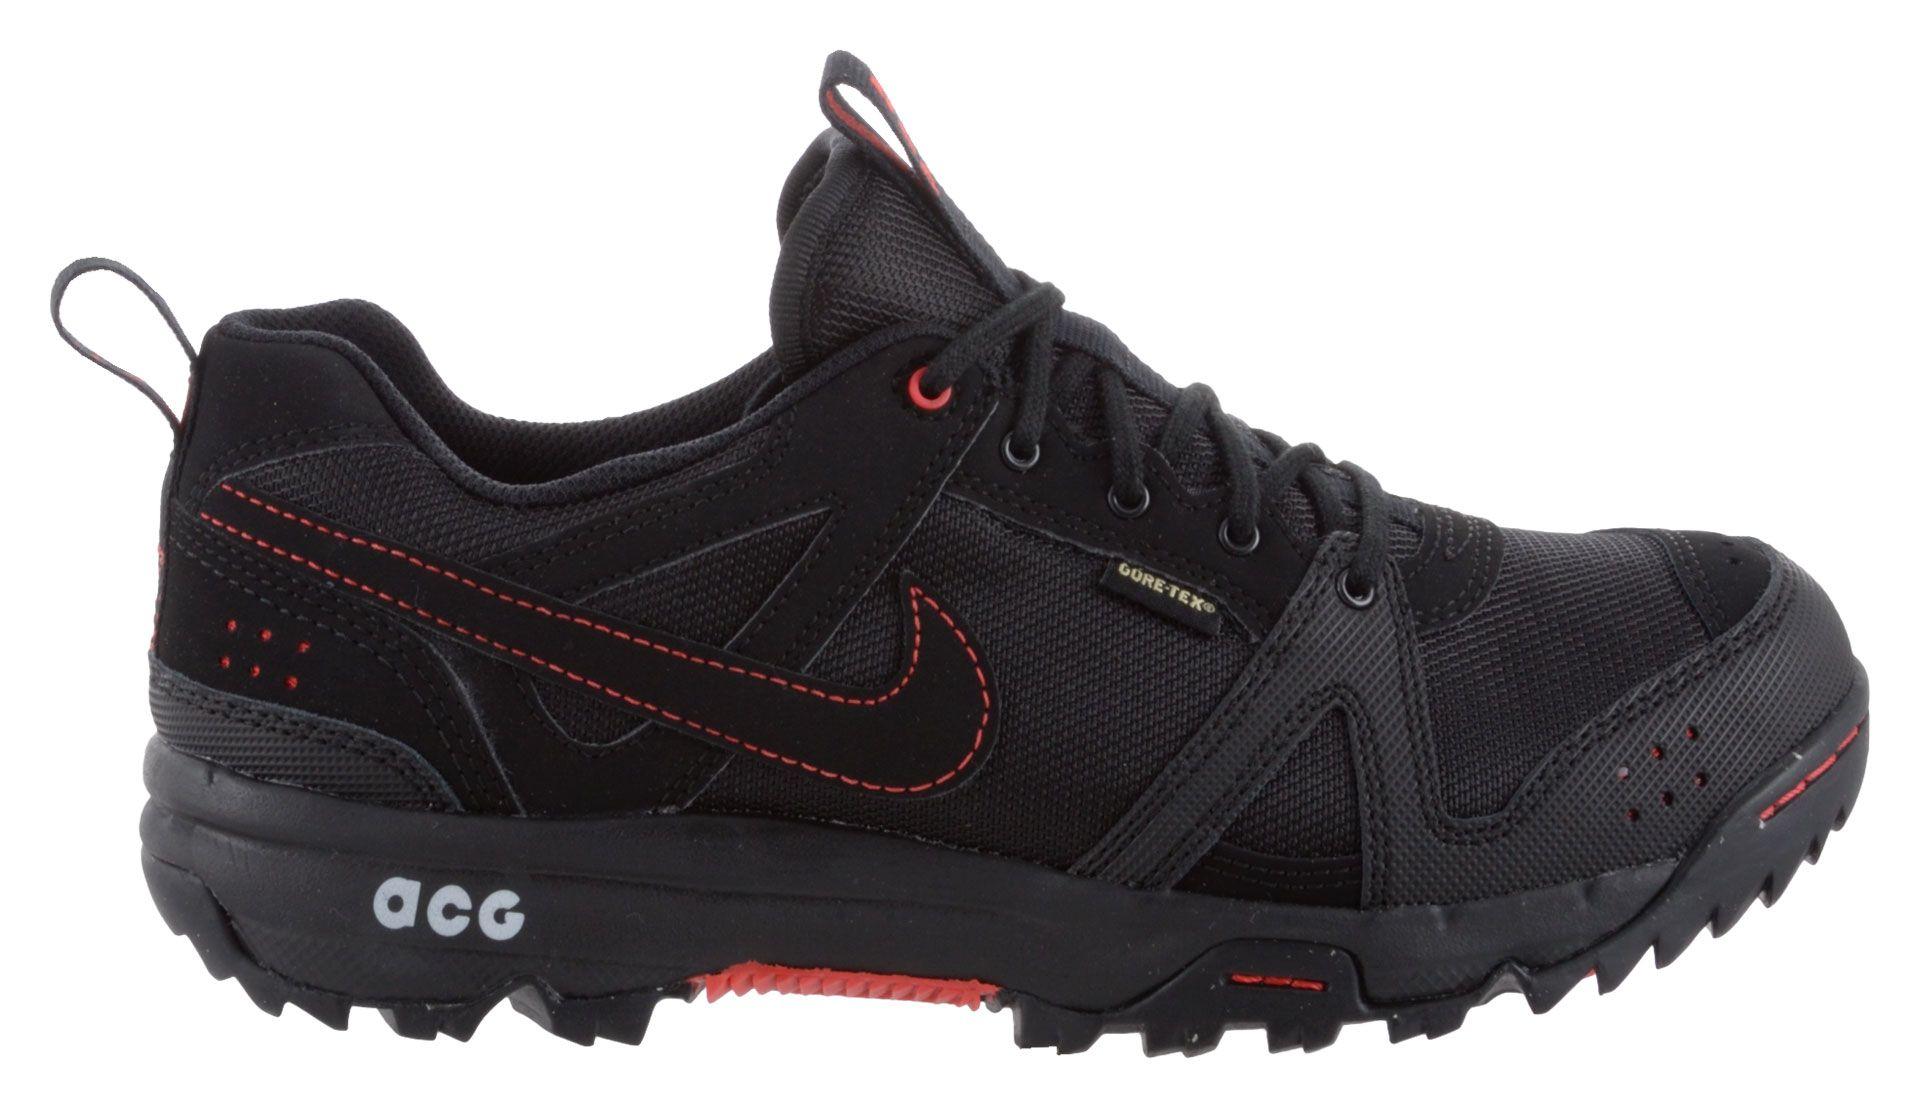 Nike ACG Rongbuk Hiking Shoe Men's